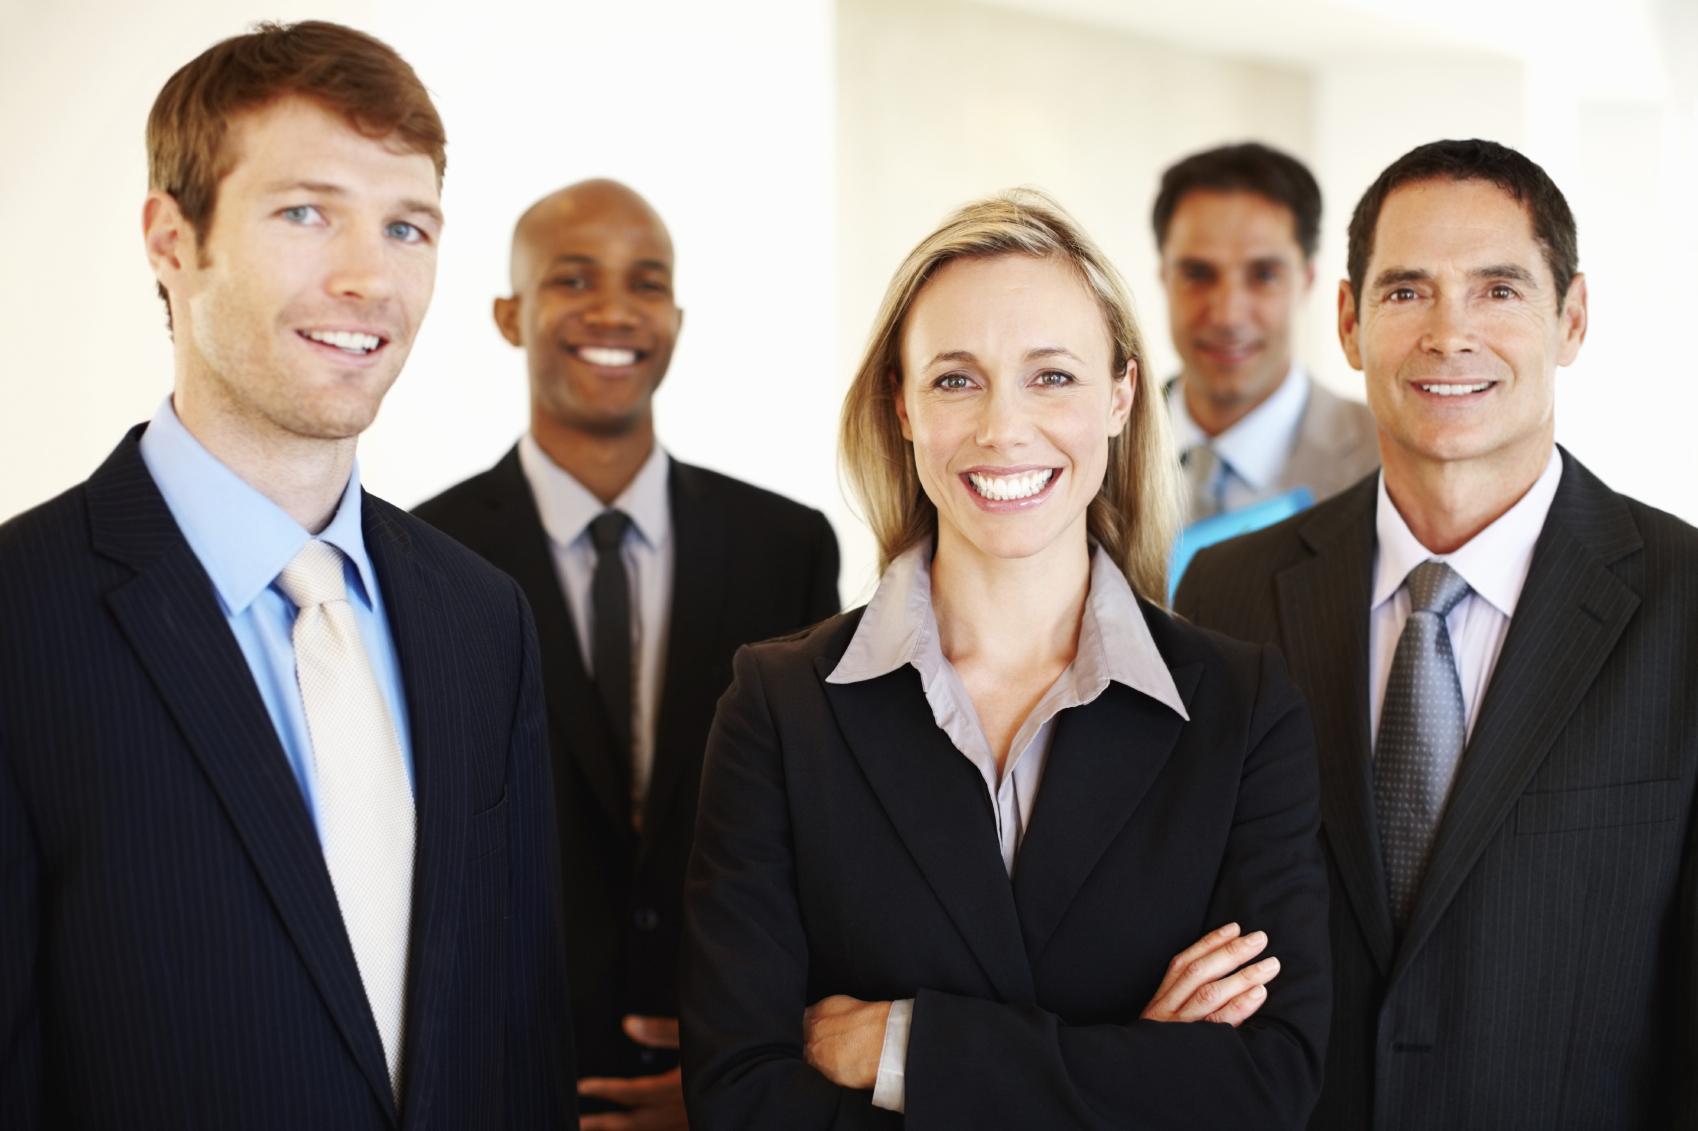 Smiling-Business-Team.jpg